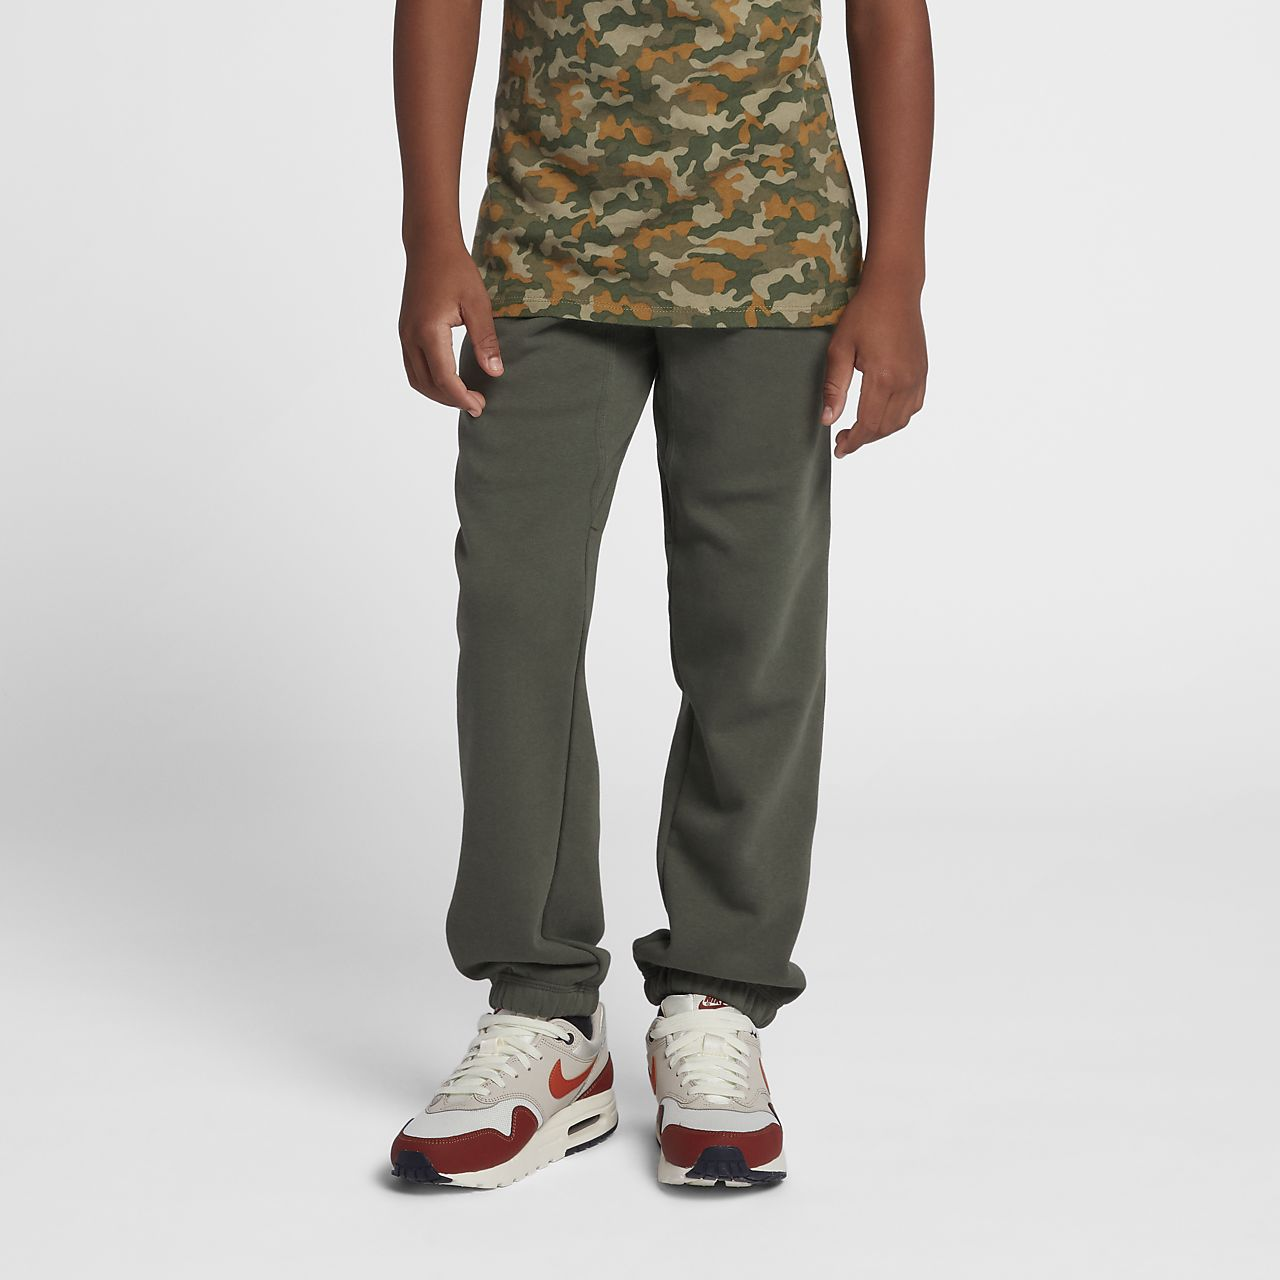 Pantalones deportivos para niño Nike Brushed-Fleece Cuffed